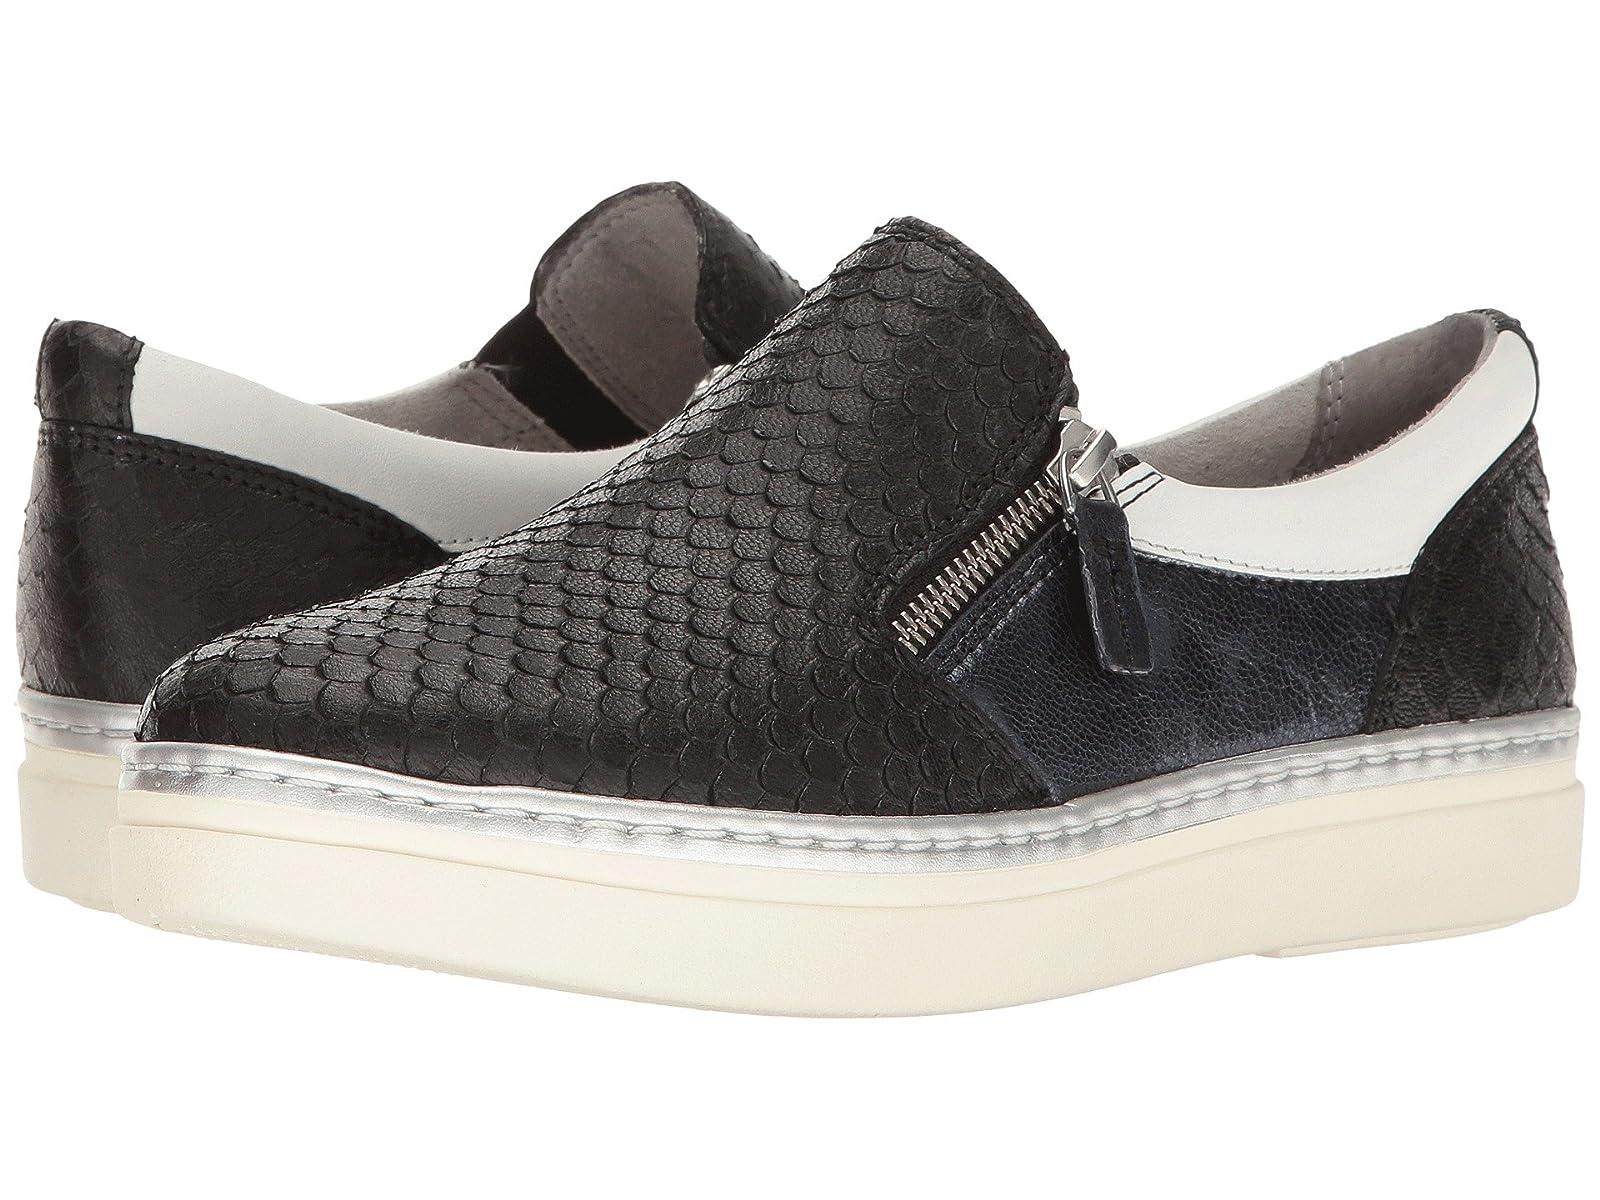 Tamaris Milla-1 1-24706-28Cheap and distinctive eye-catching shoes